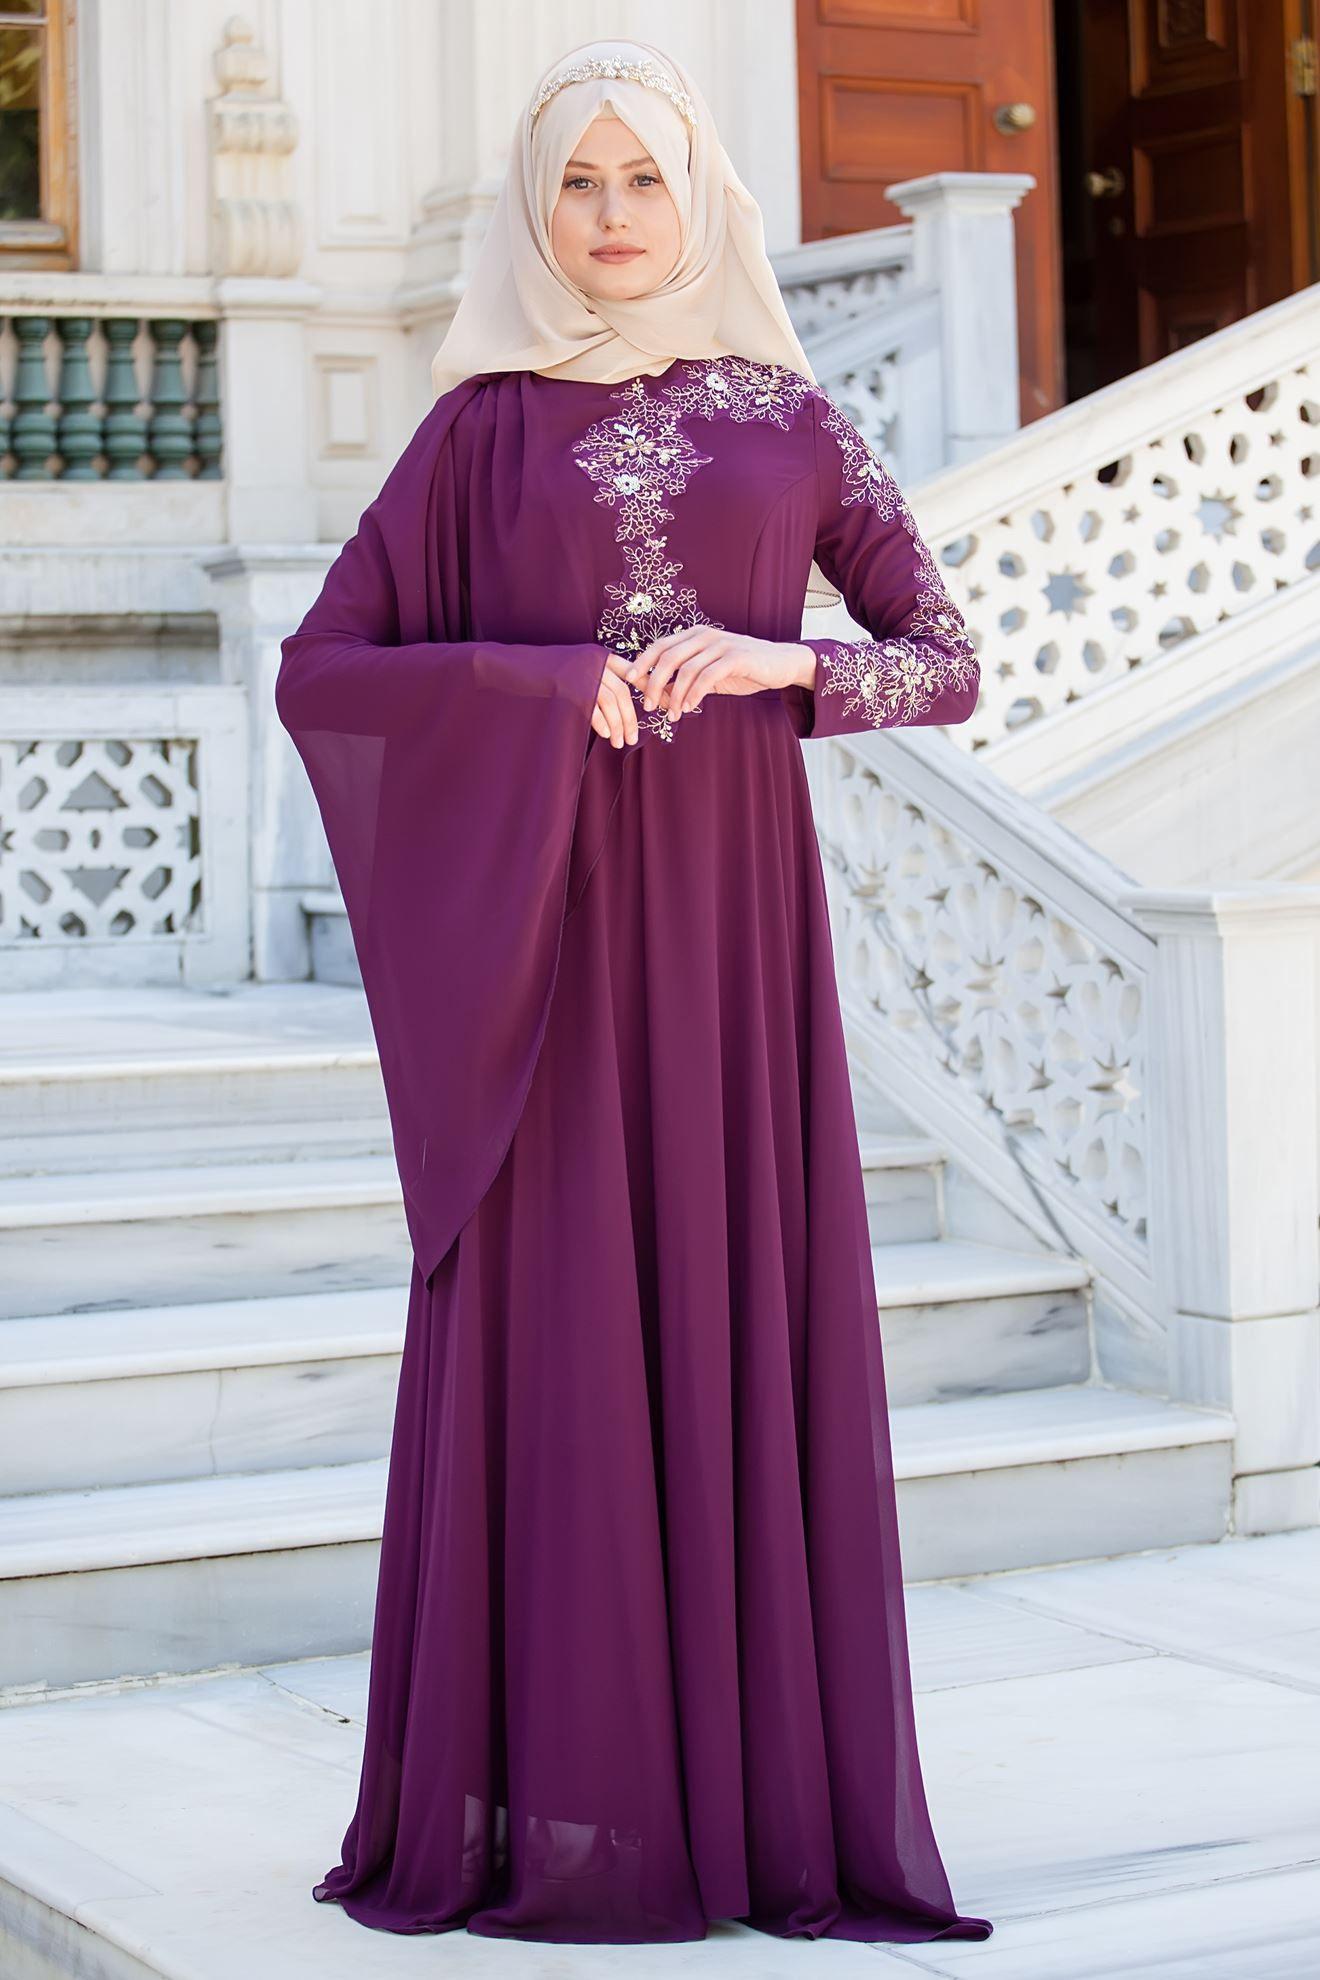 9223e427a87c4 En Güzel Sedanur.com Tesettür Abiye Elbise Modelleri , https://www.